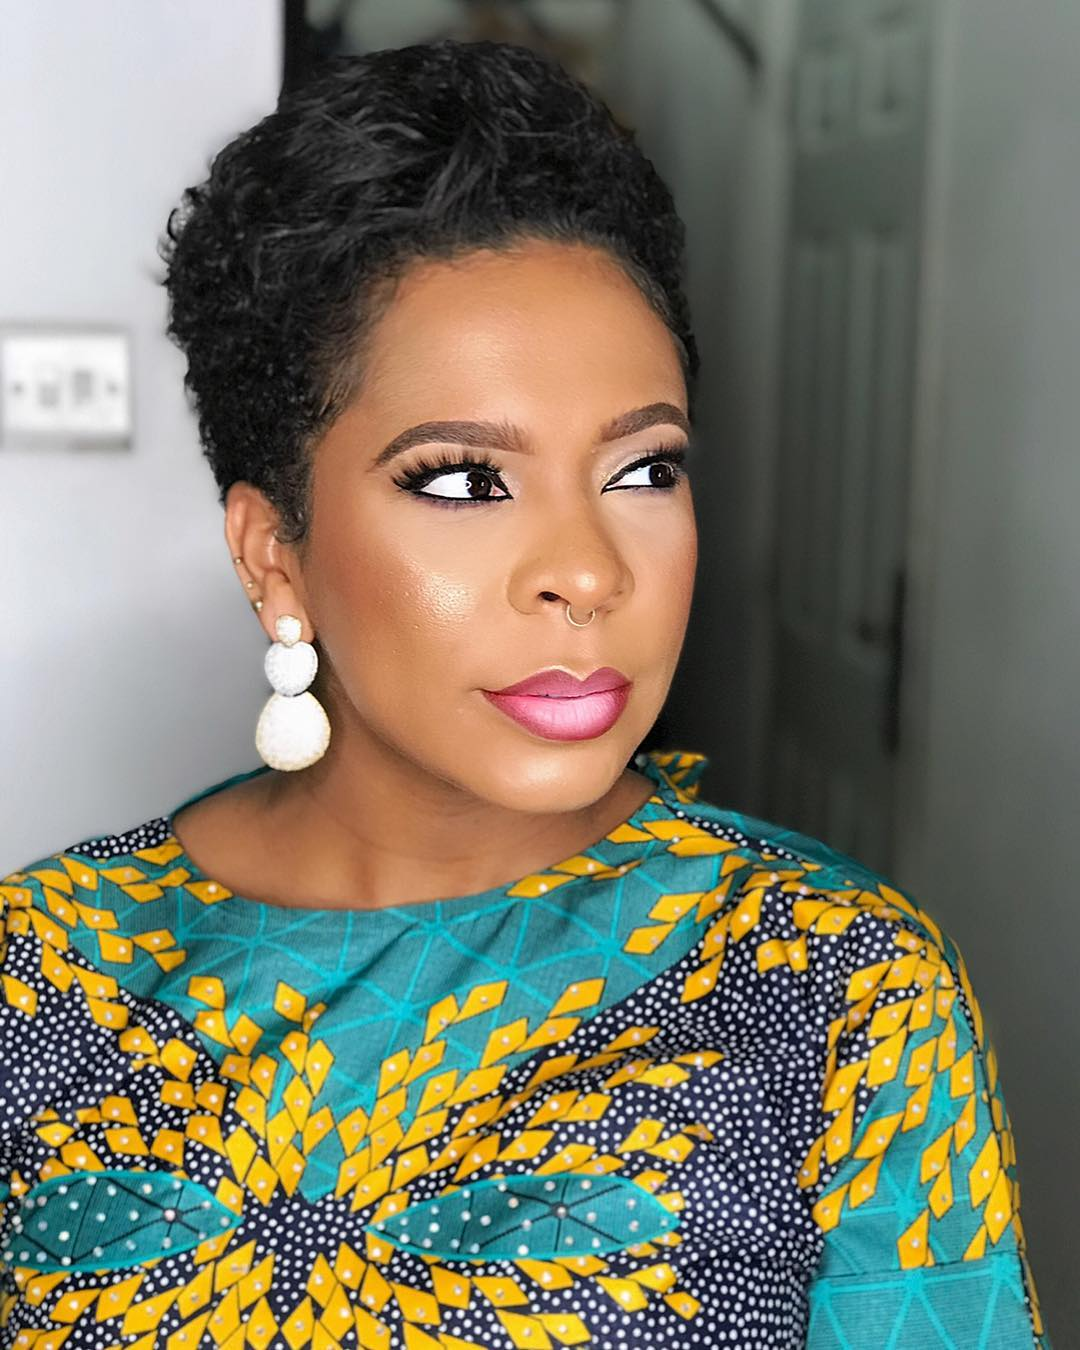 Ex-BB Naija Star, Tboss Reveals Some Of Her Bad Habits